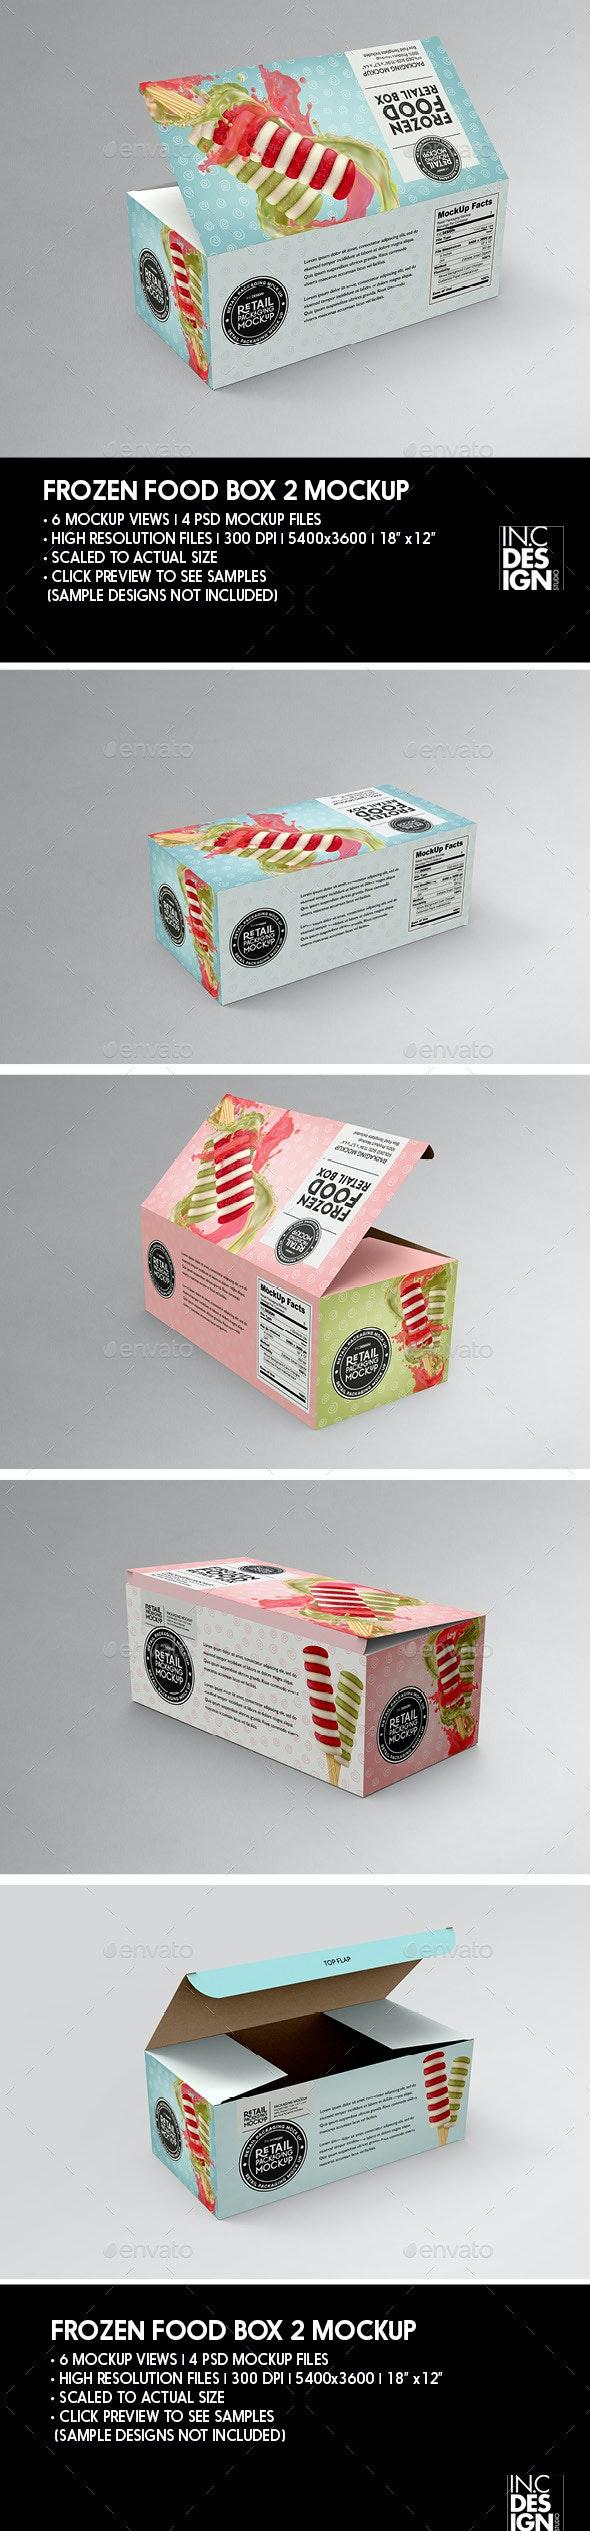 Big Frozen Food Box Packaging Mockup - Packaging Product Mock-Ups